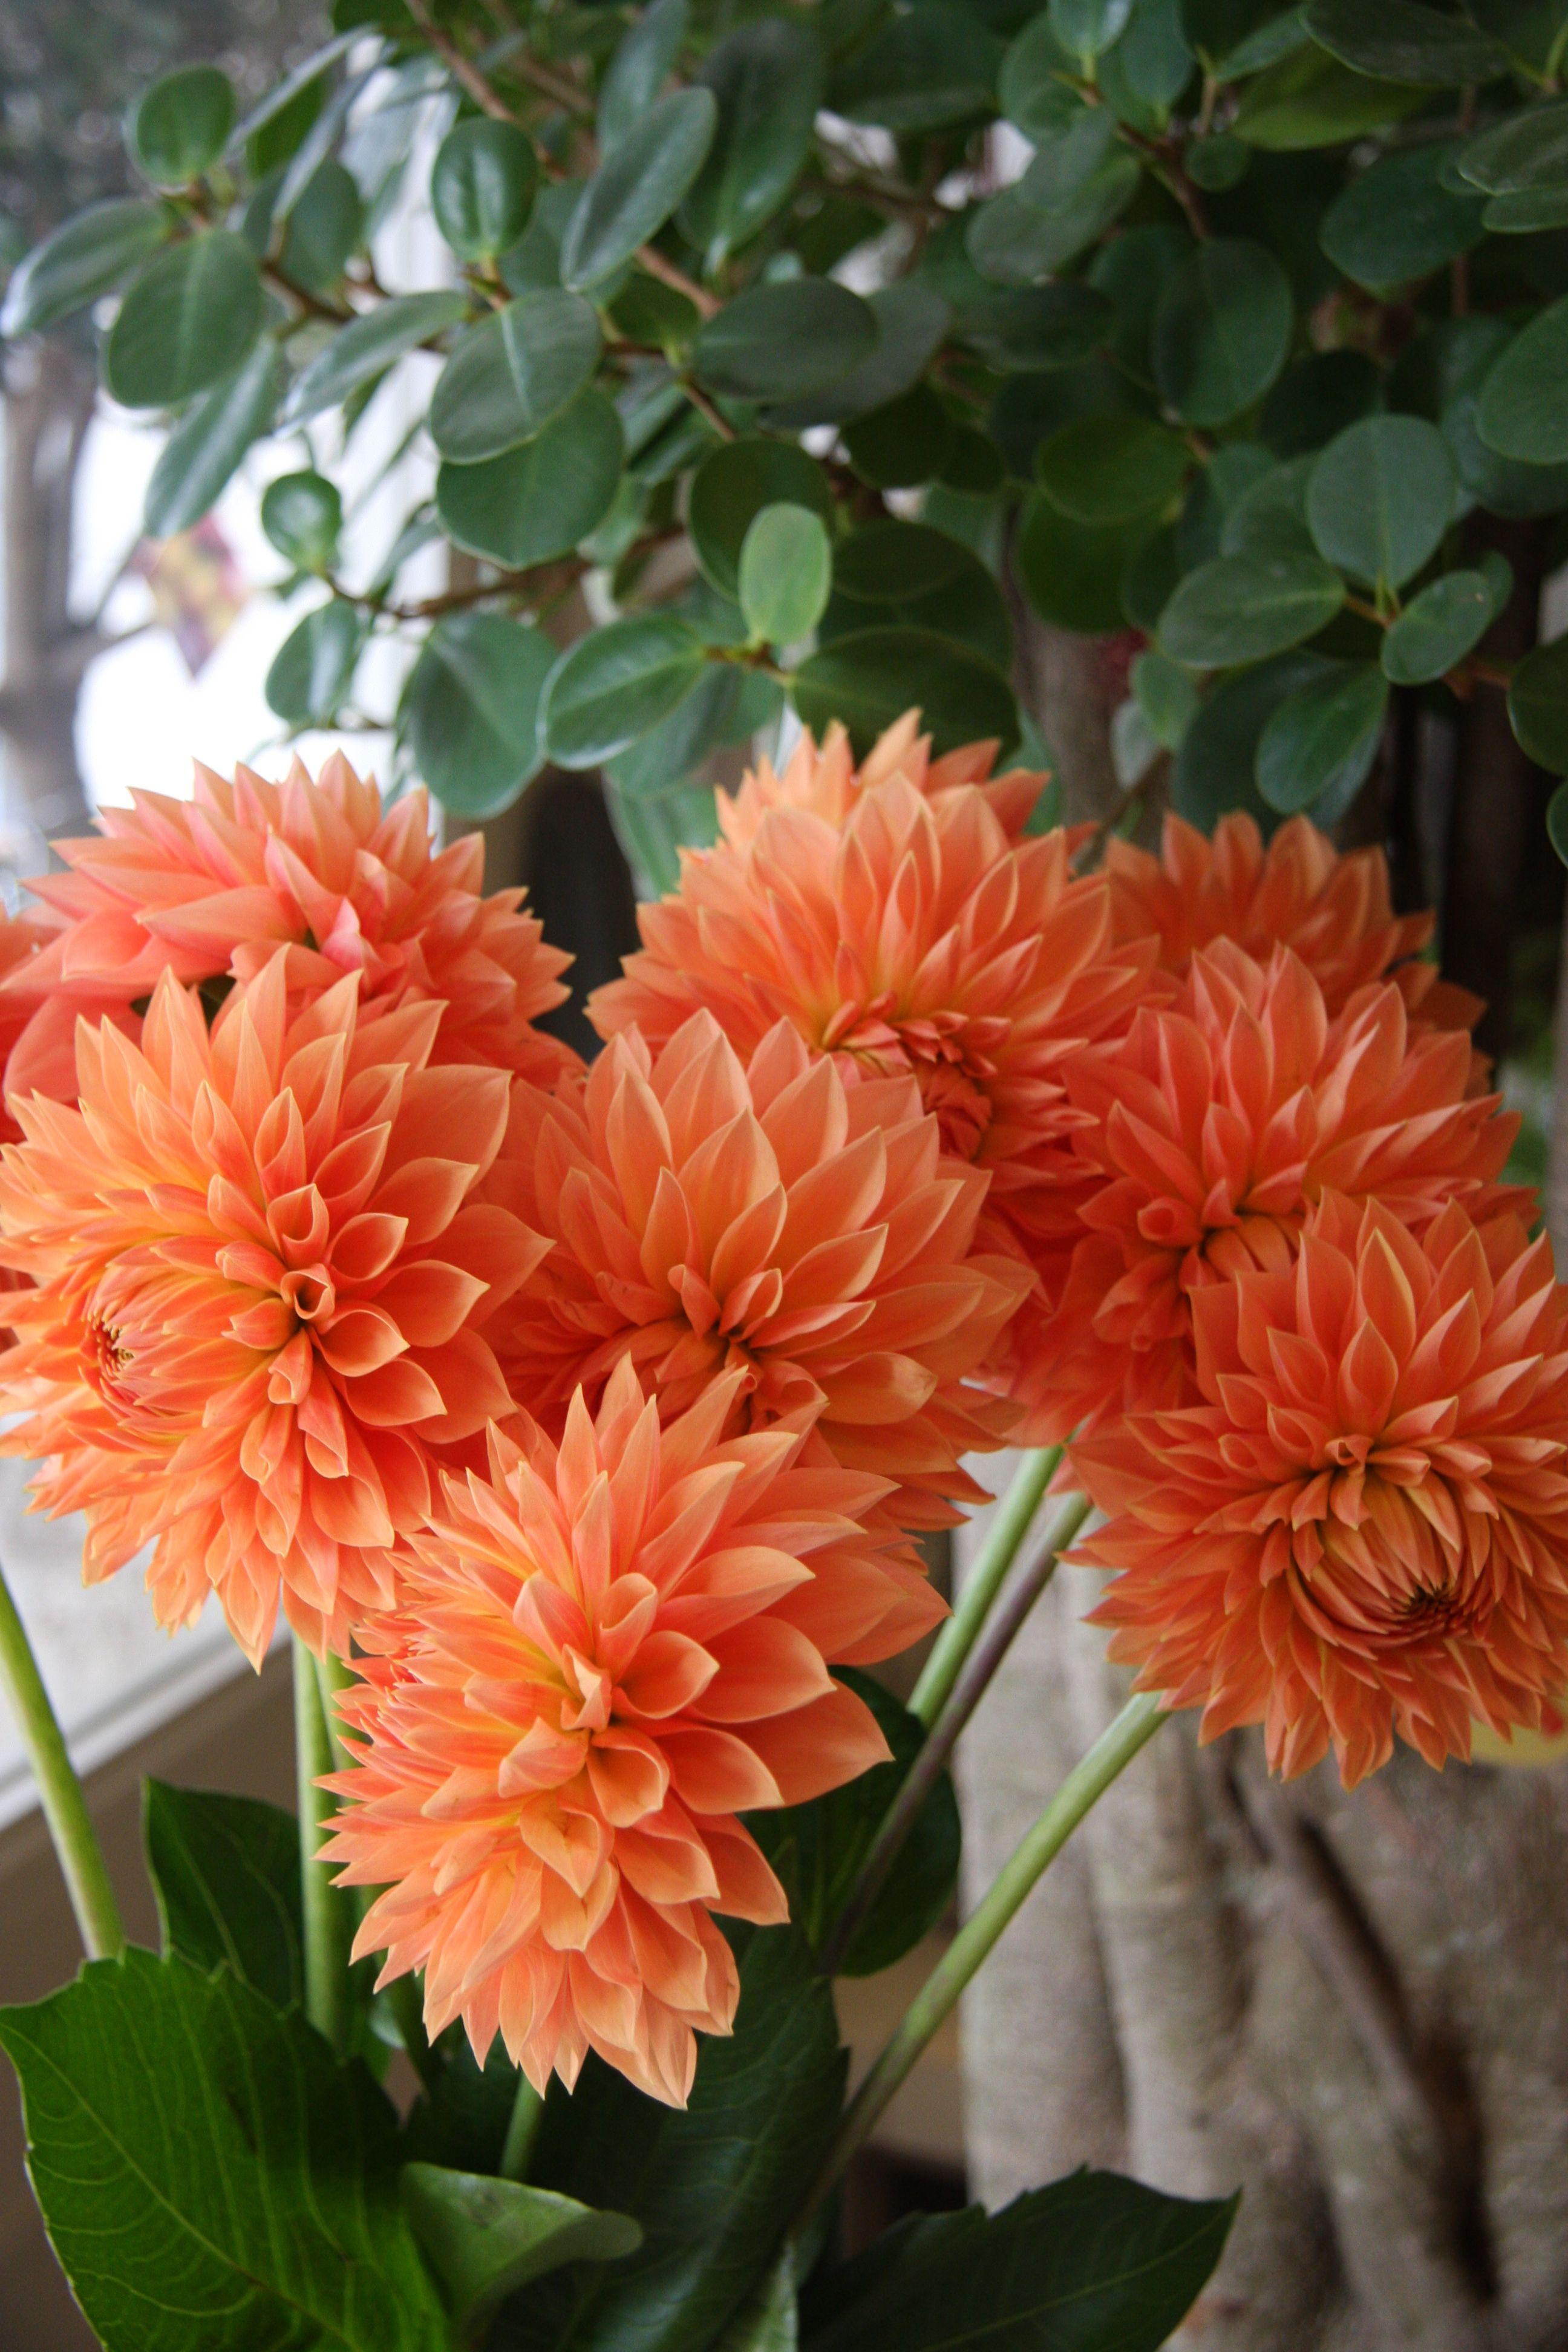 Pin Ot Polzovatelya Katarzyna Andrzejewska Na Doske Flowers In Orange Selected By Tremolo Georginy Cvety